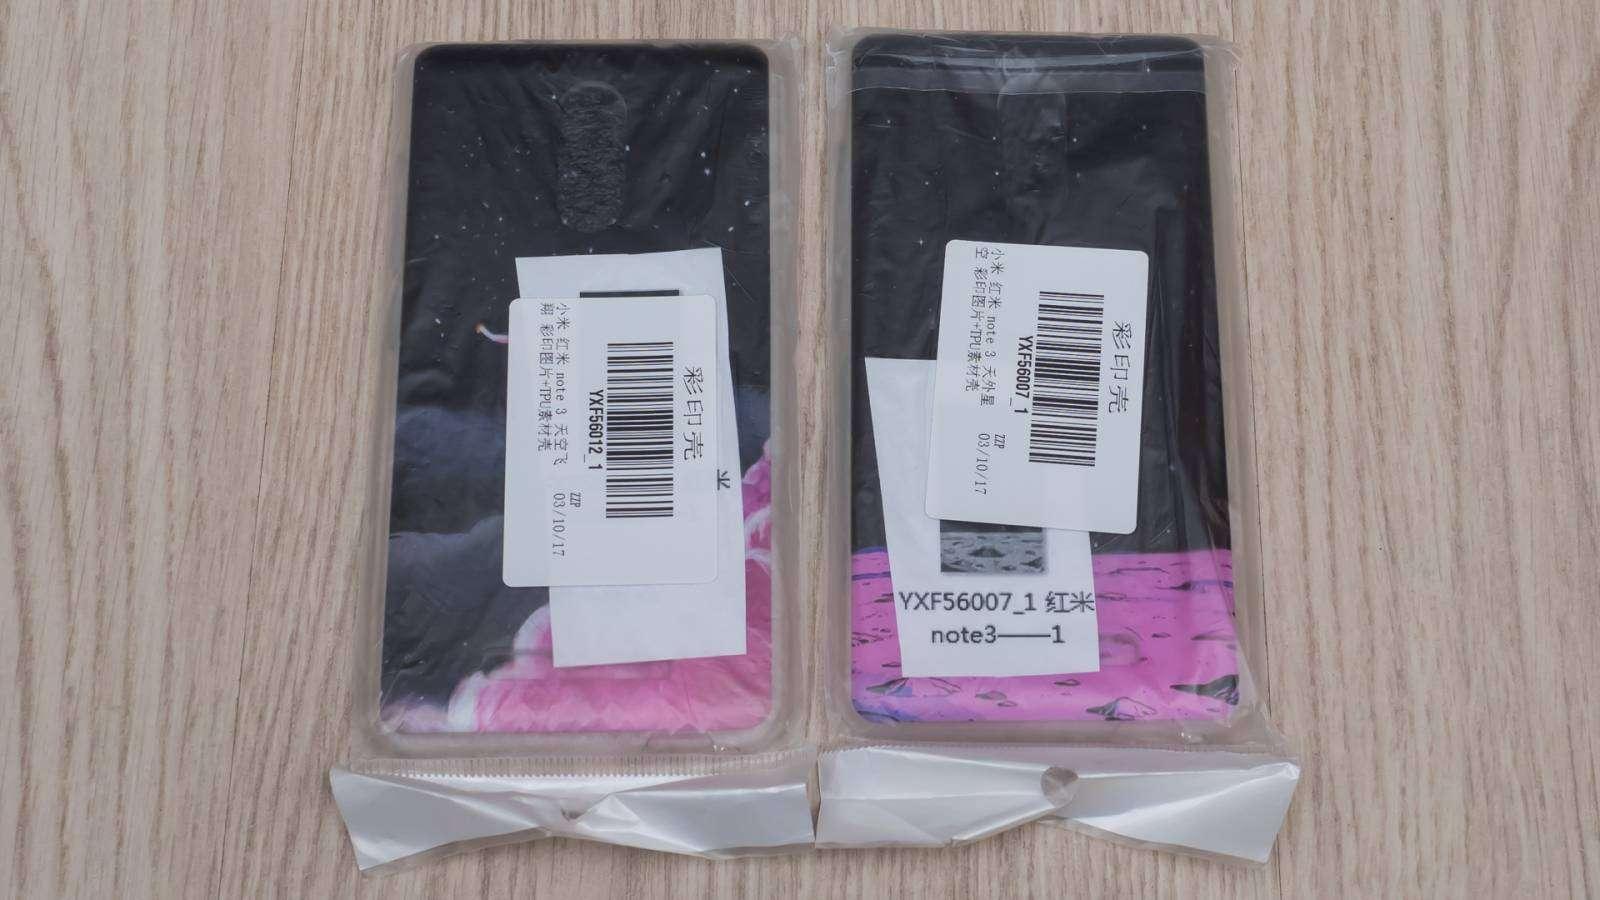 Aliexpress: Пара силиконовых бамперов для Xiaomi Redmi Note 3